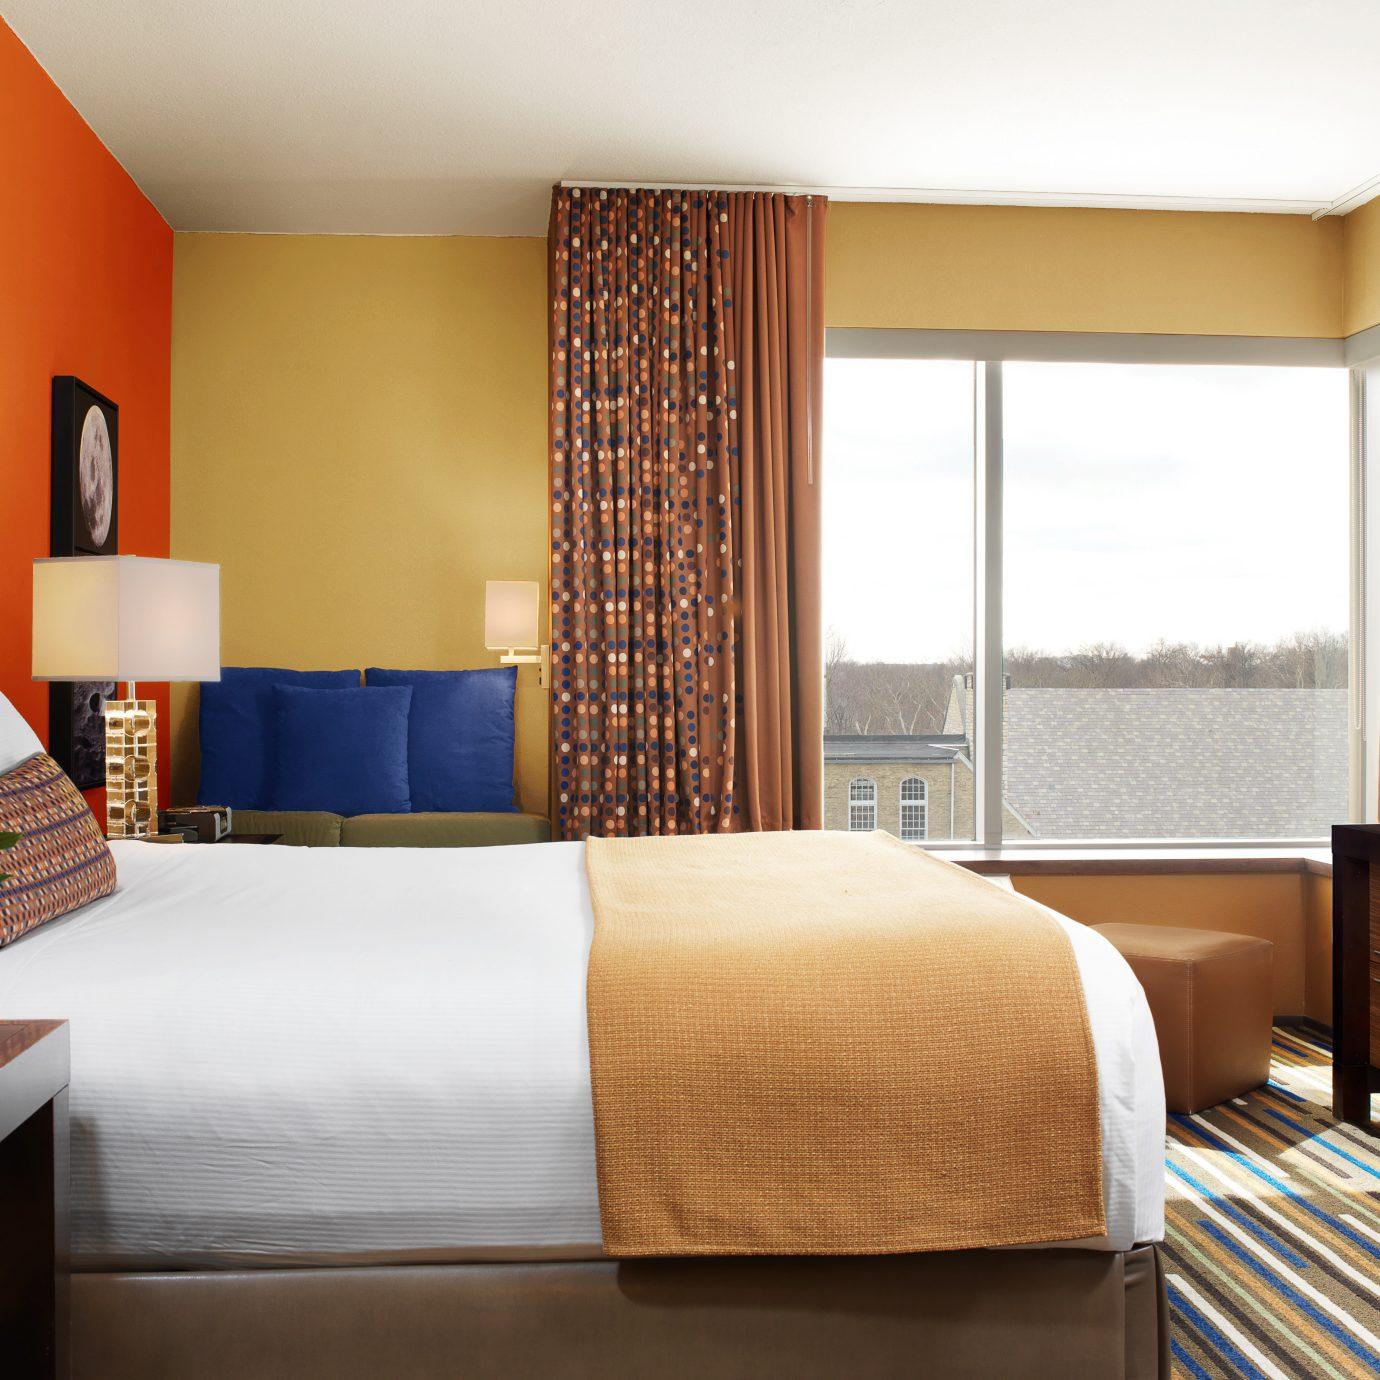 Bedroom Modern Resort Scenic views sofa property Suite condominium cottage living room bed sheet lamp flat